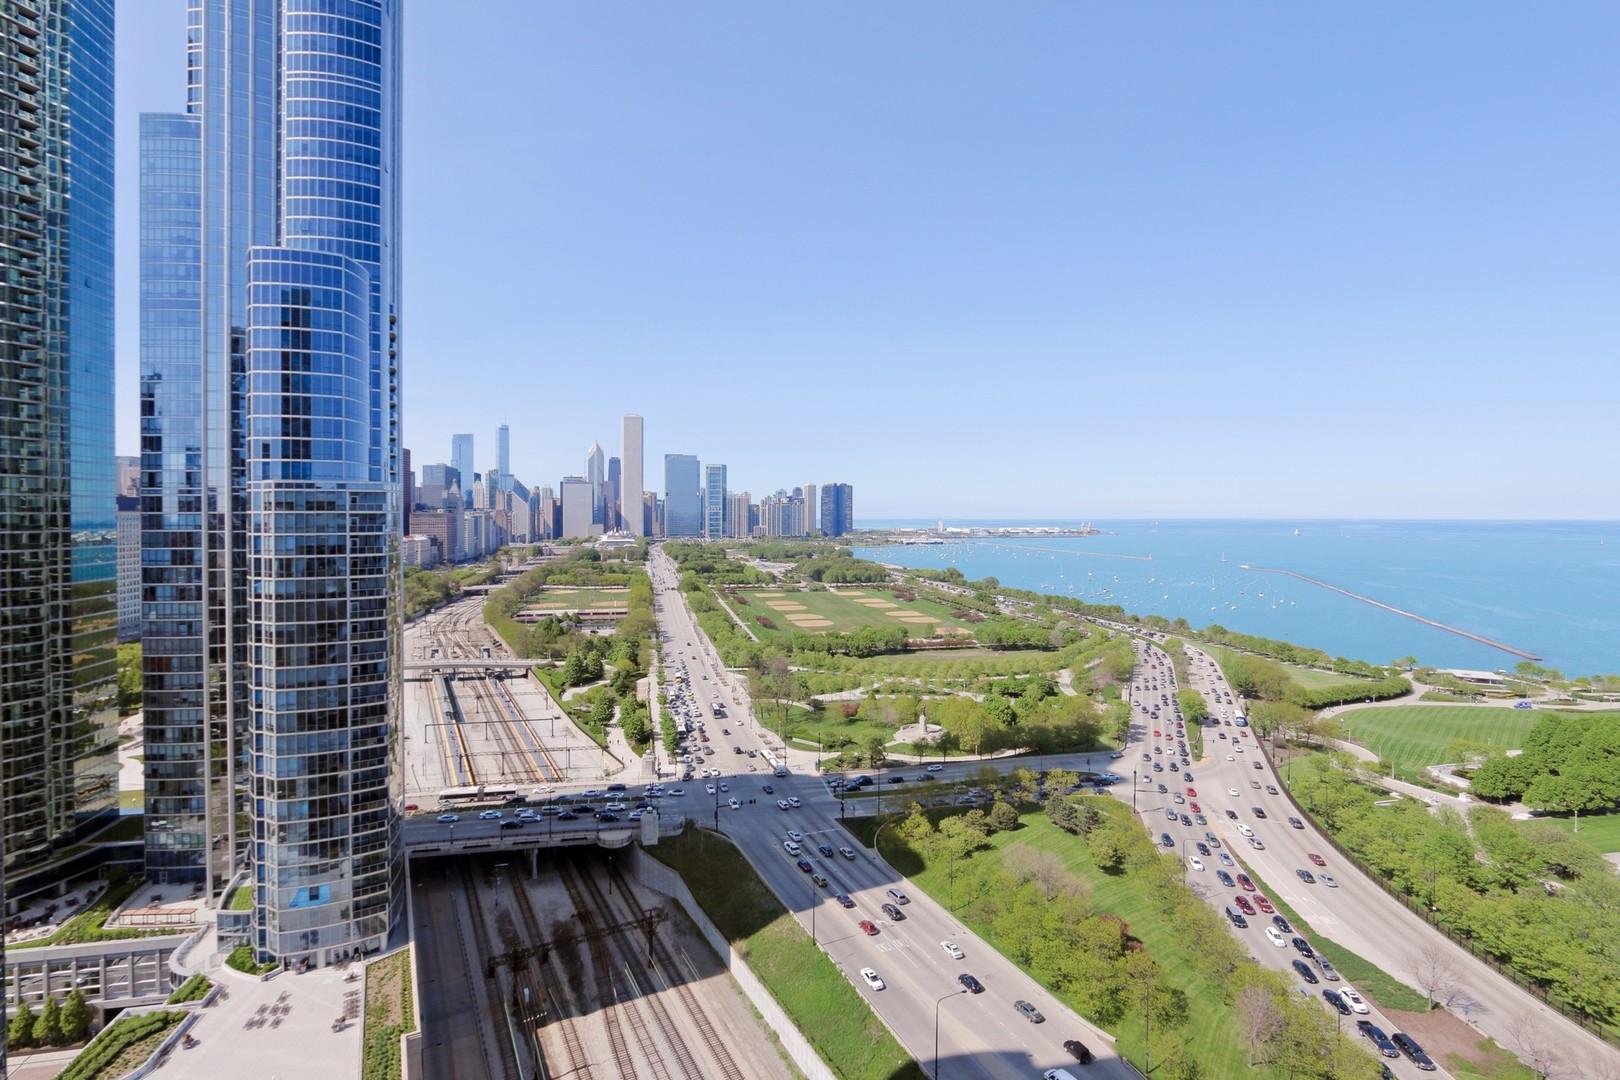 233 13th Unit Unit 1802 ,Chicago, Illinois 60605